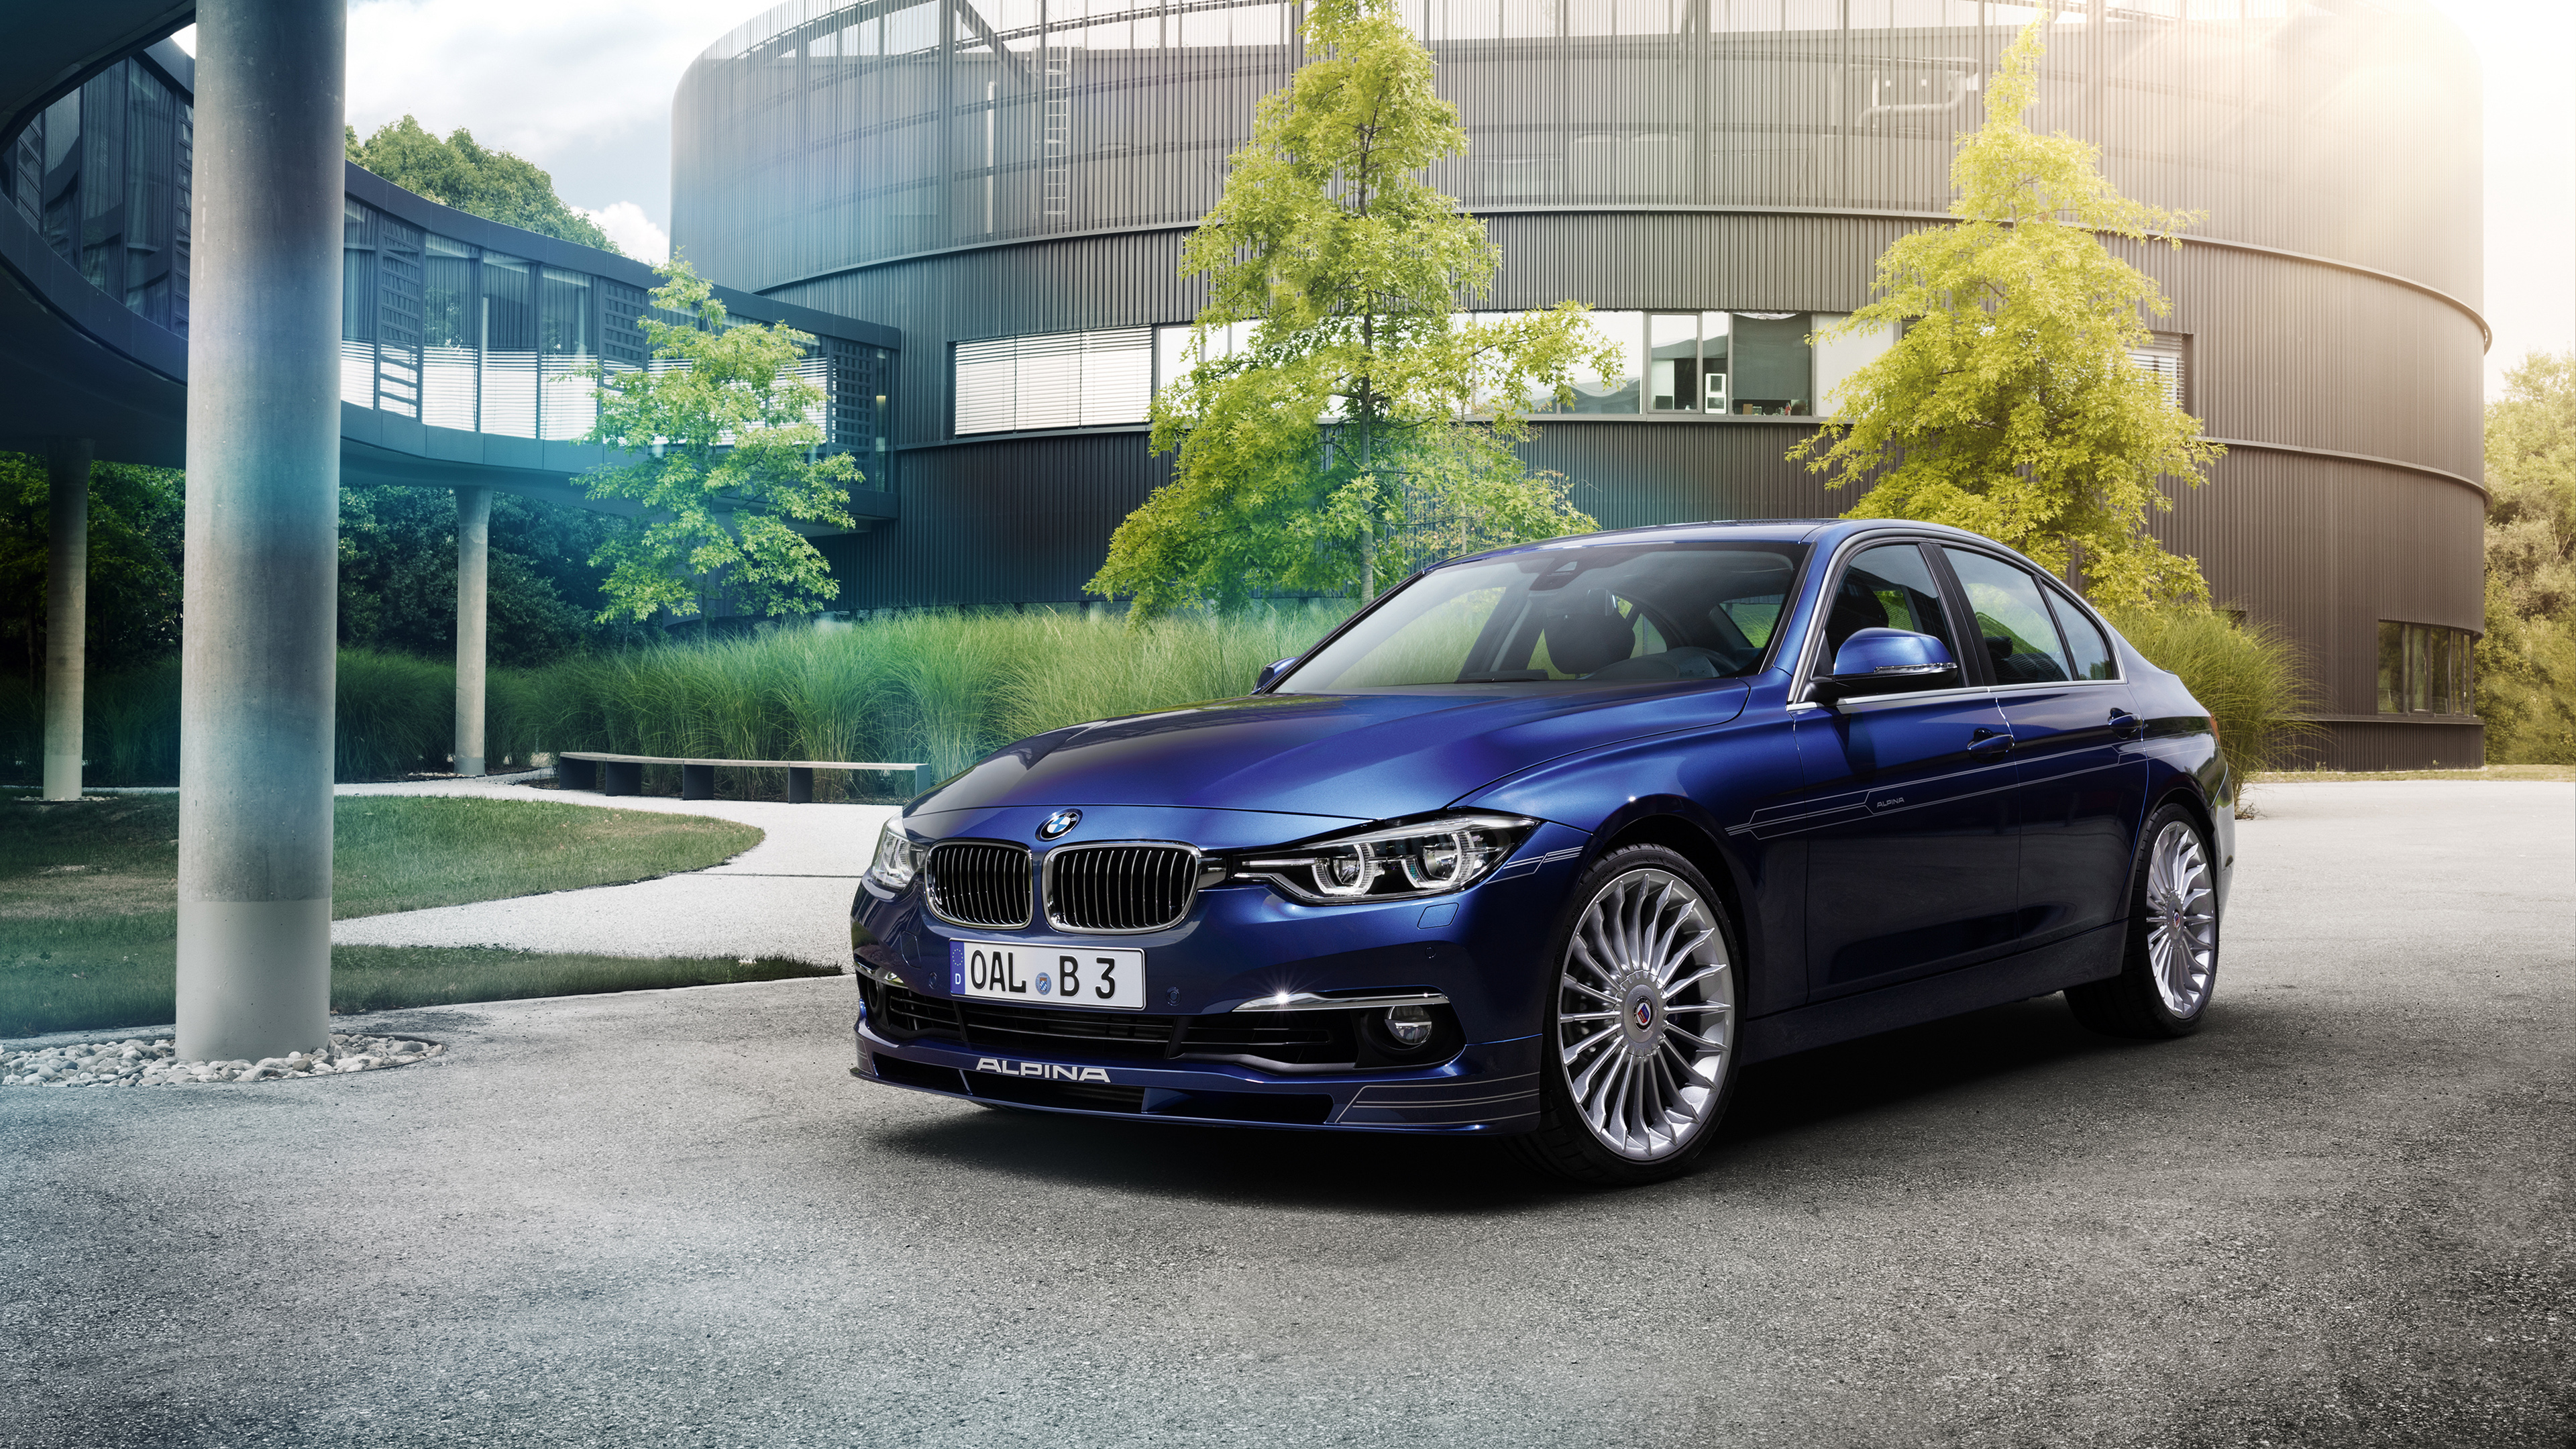 2015 Alpina B3 BMW 3 Series Wallpaper | HD Car Wallpapers ...